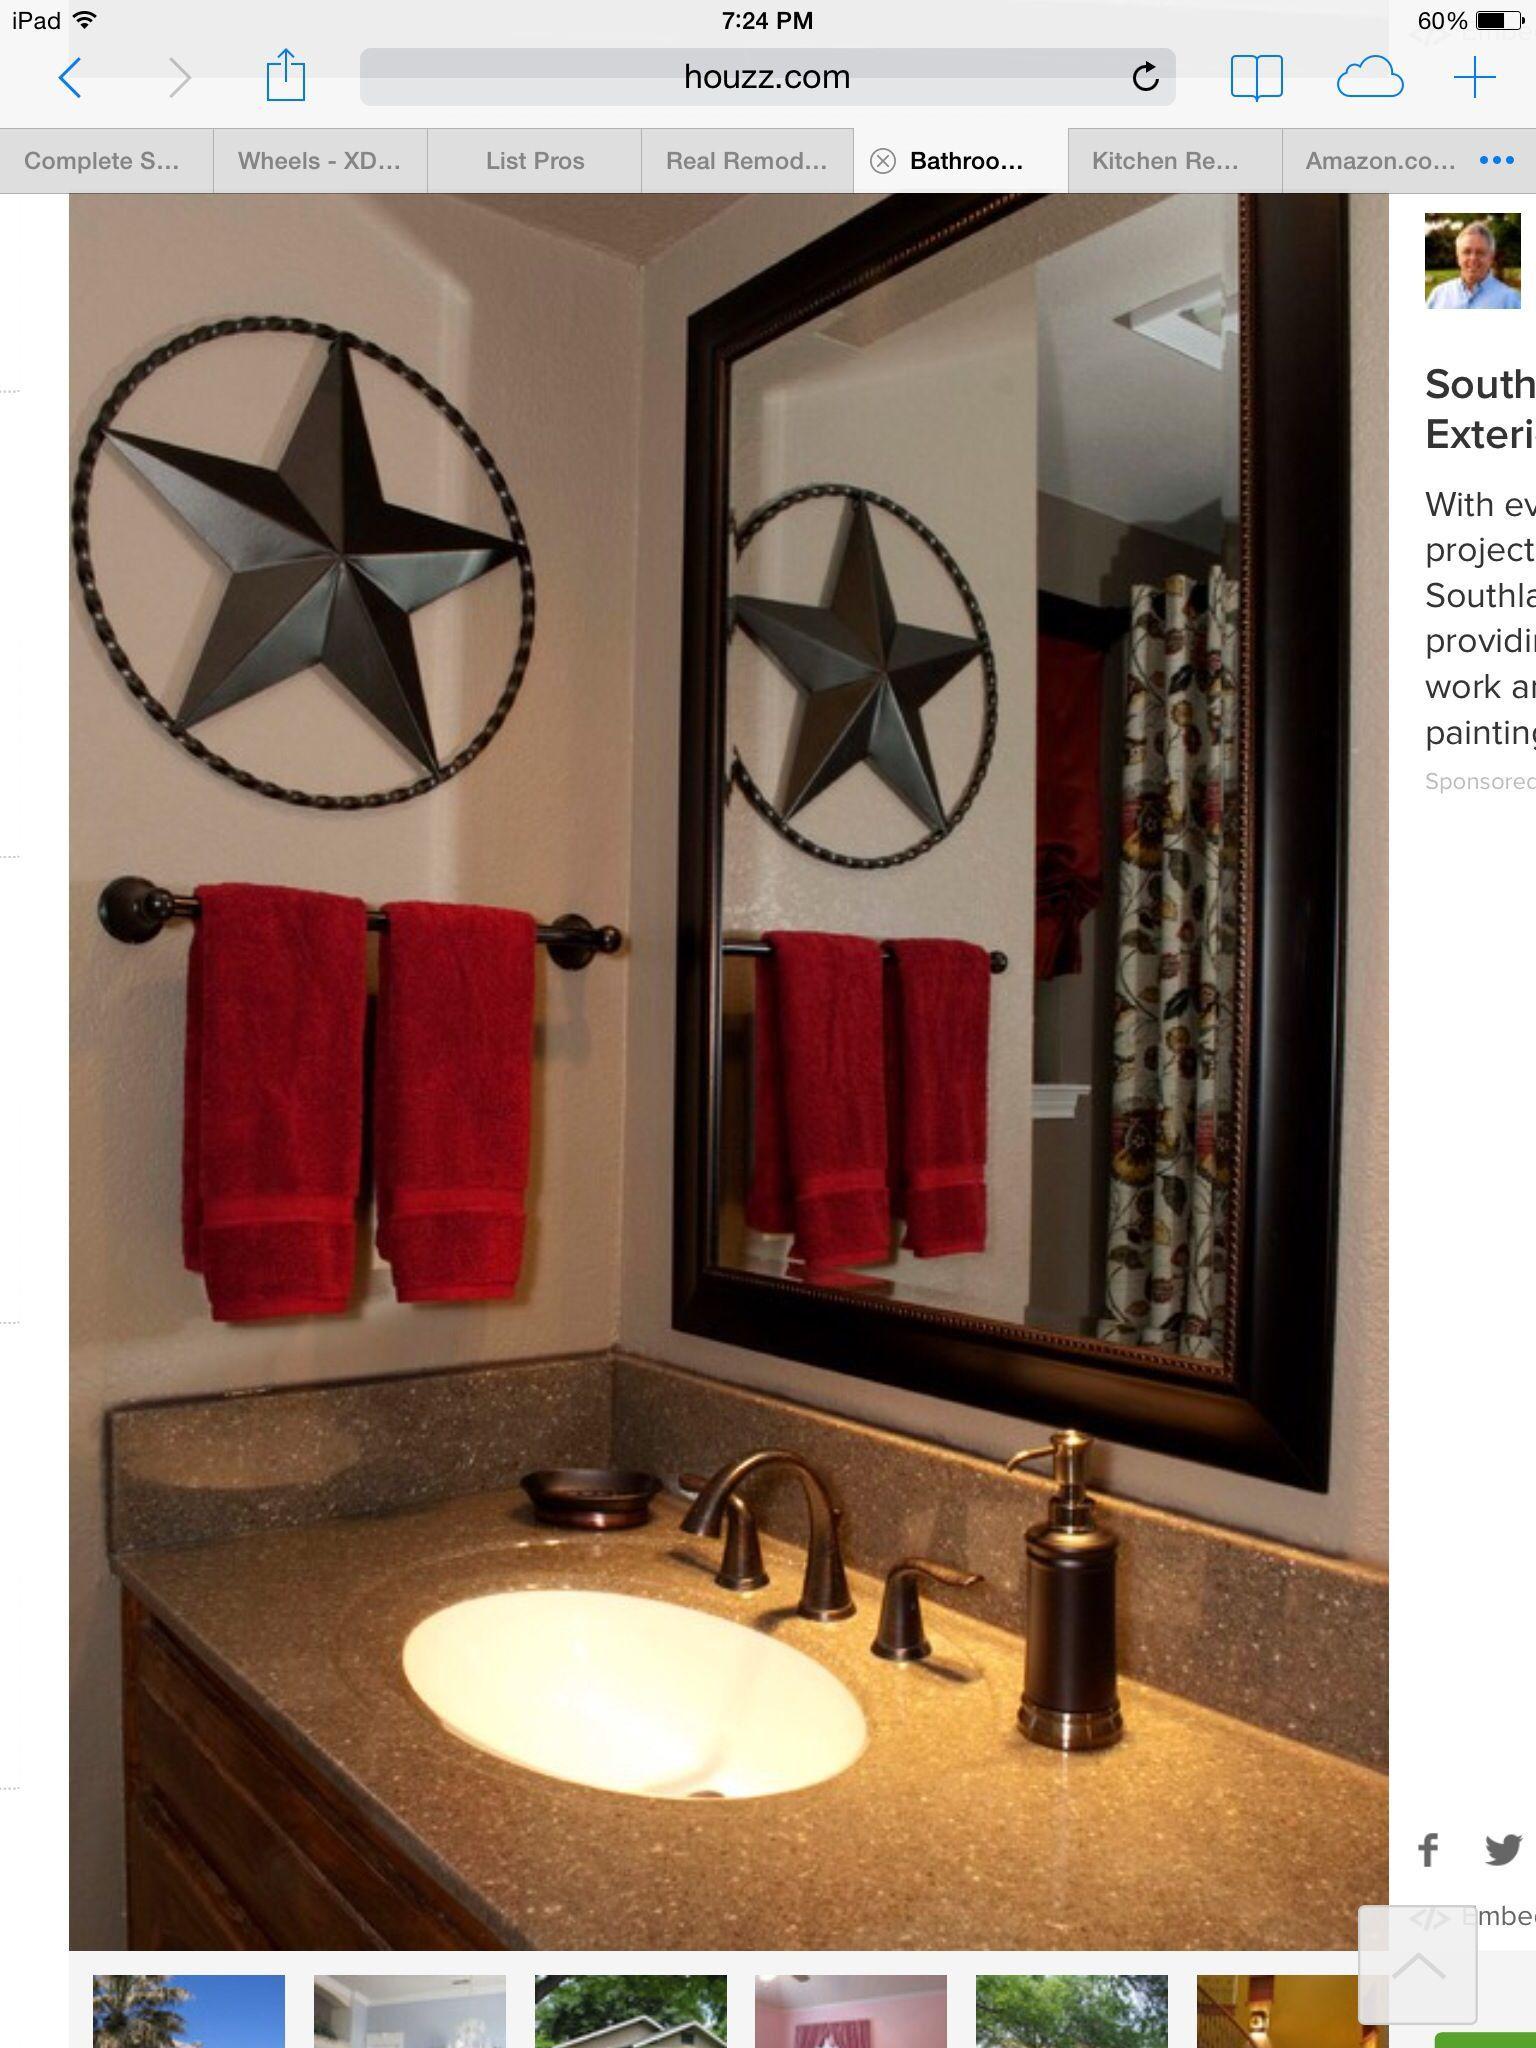 Texas Bathroom Decor 8 in 8  Bathroom red, Texas home decor